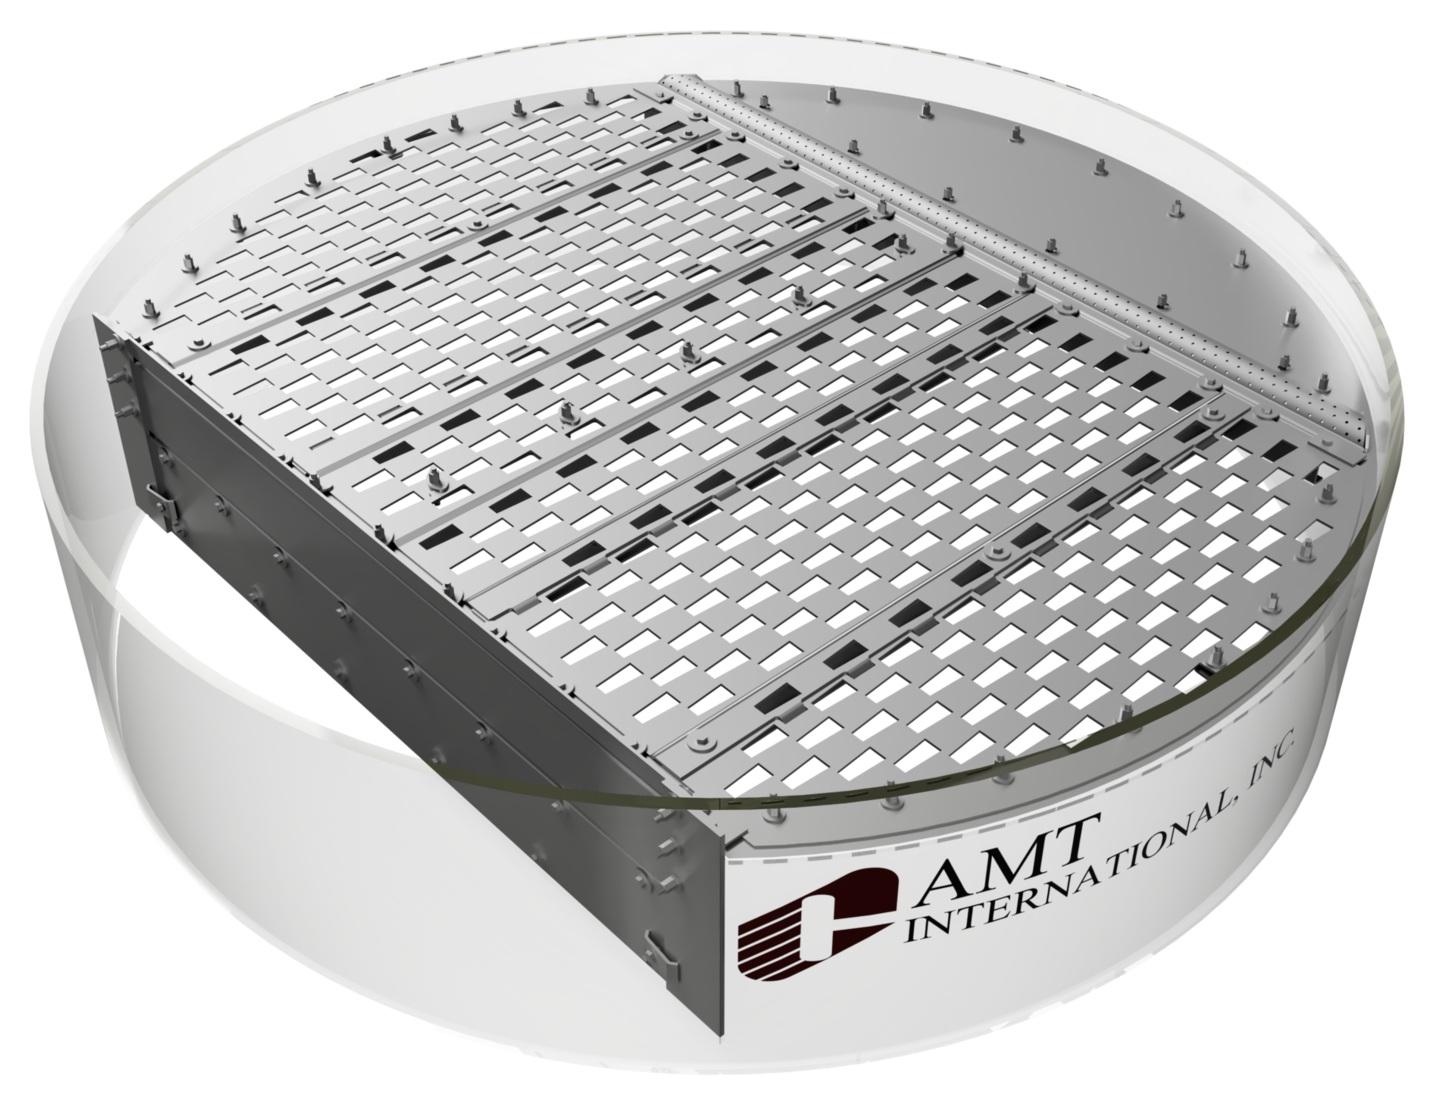 AMT International EPV Tray Iso Render.jpg